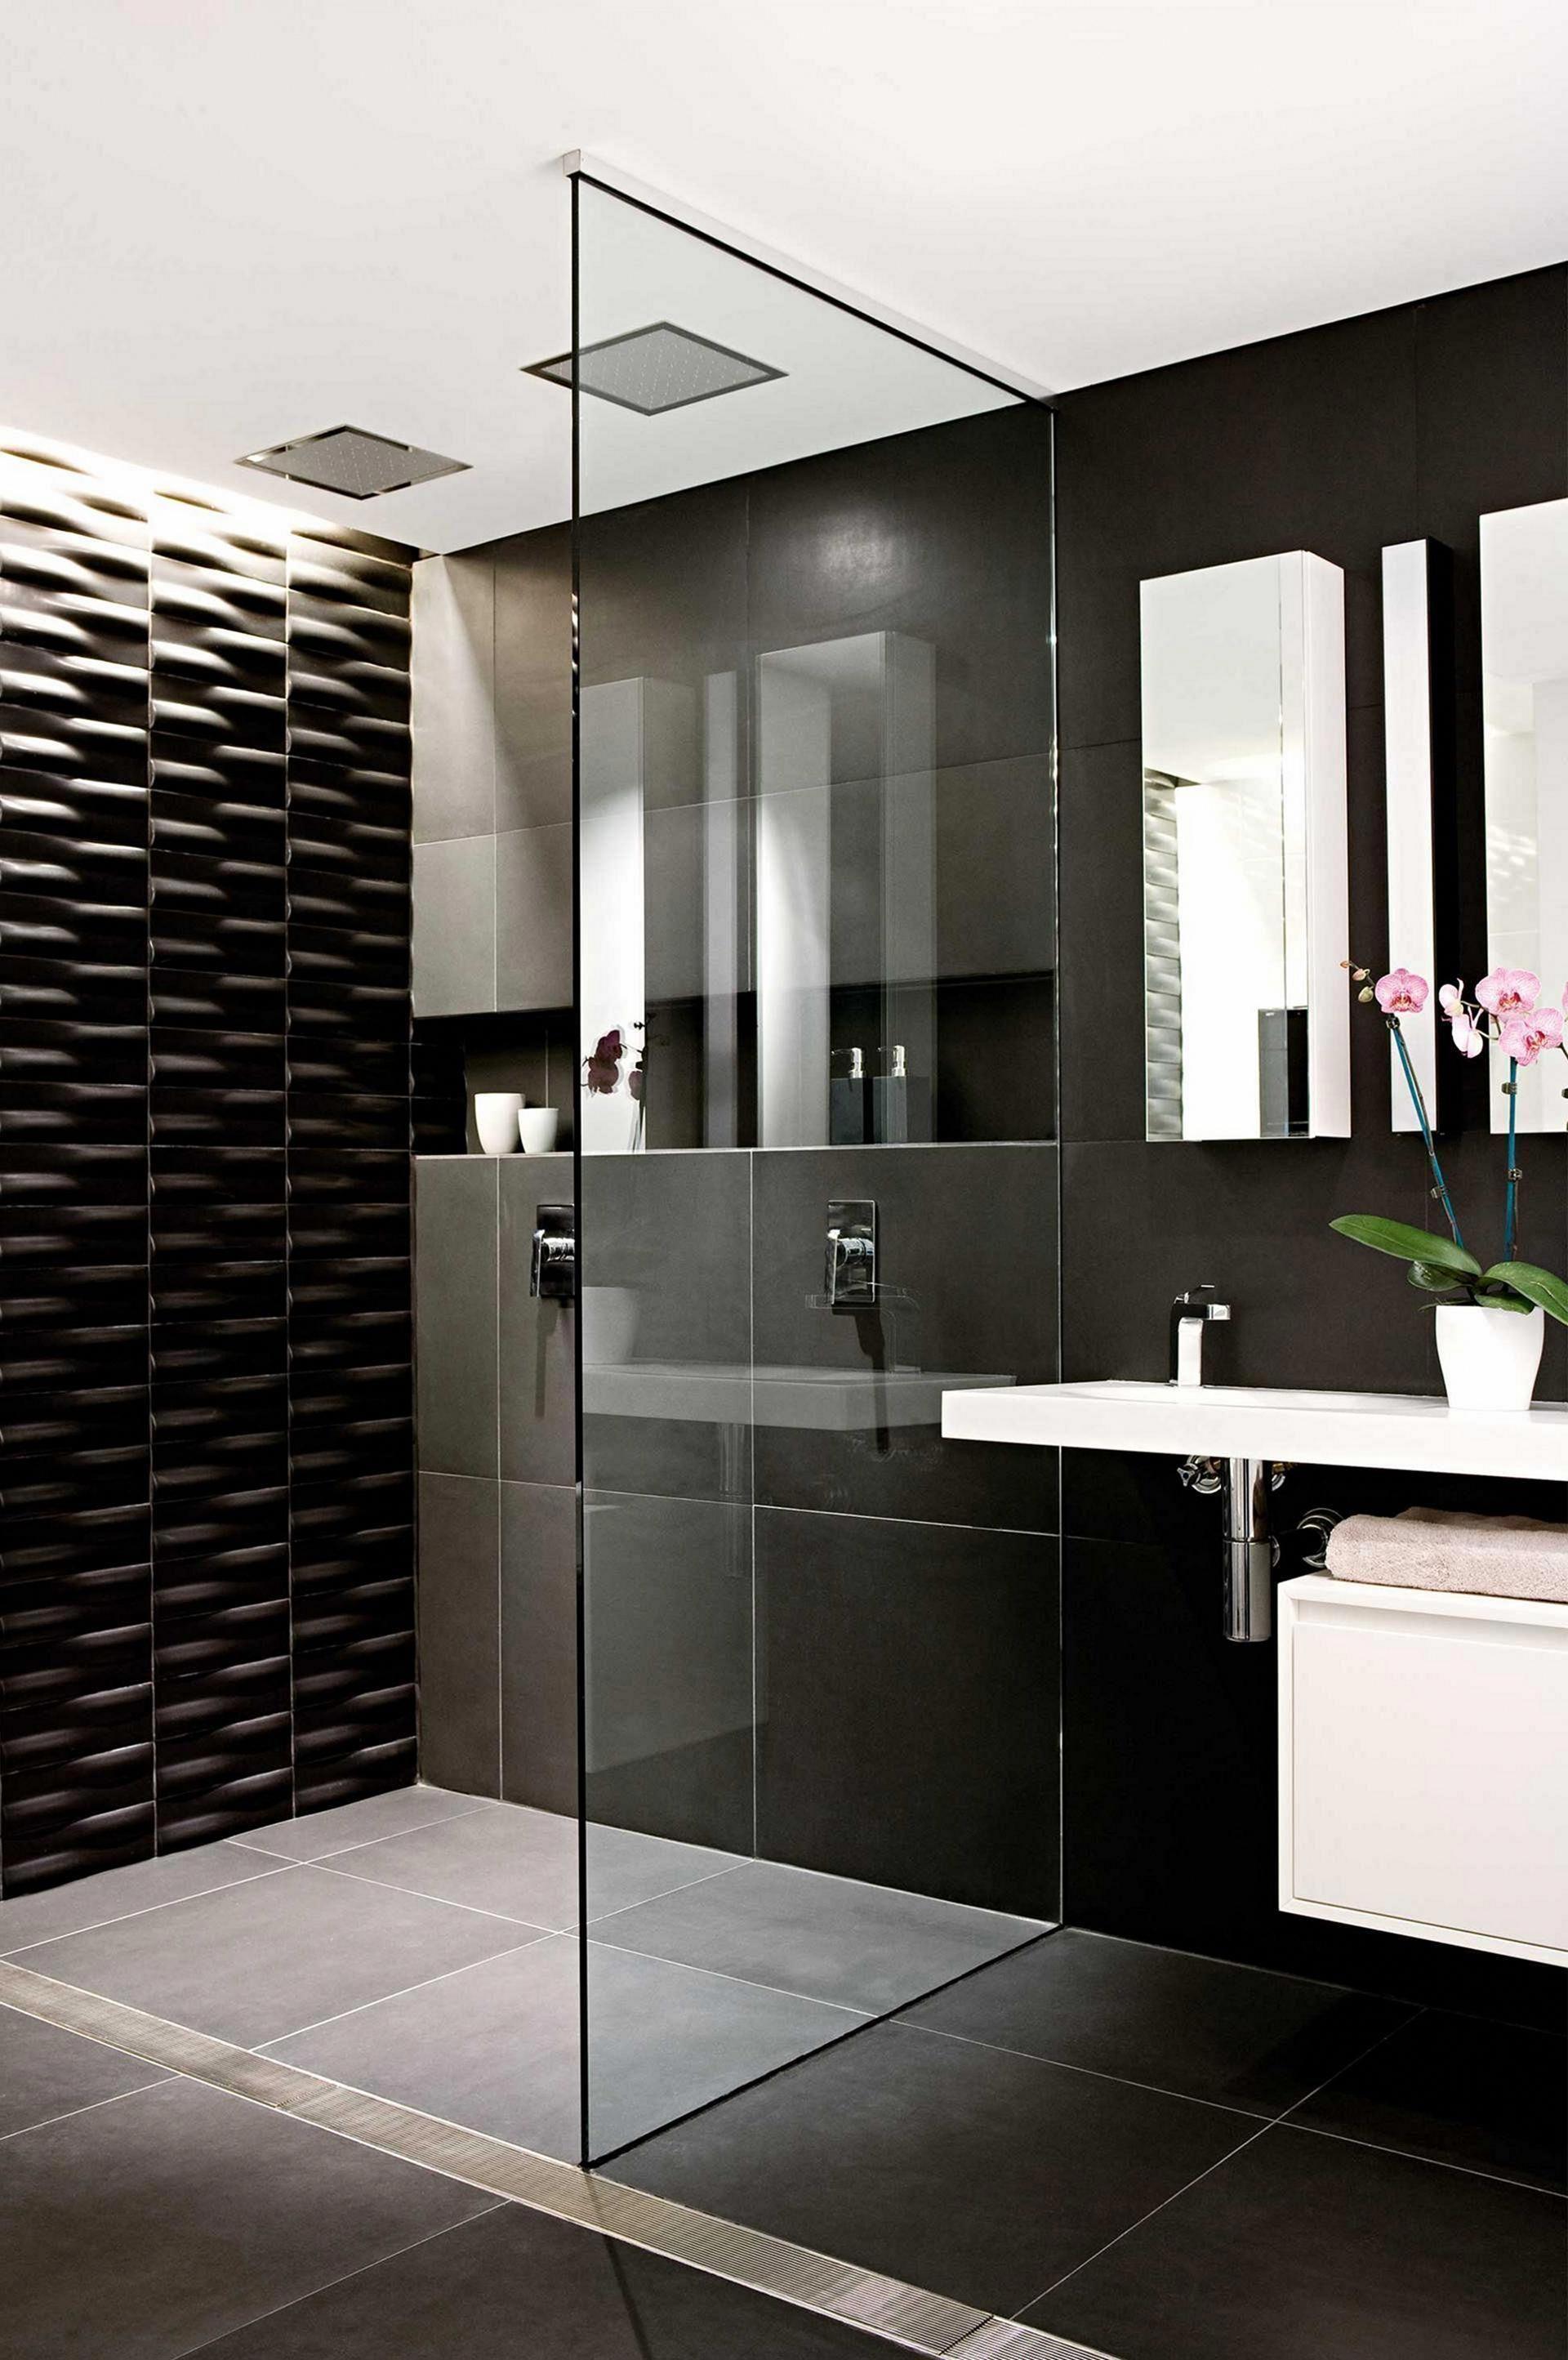 Luxurybathrooms Black Bathroom Bathroom Design Brown Bathroom Decor